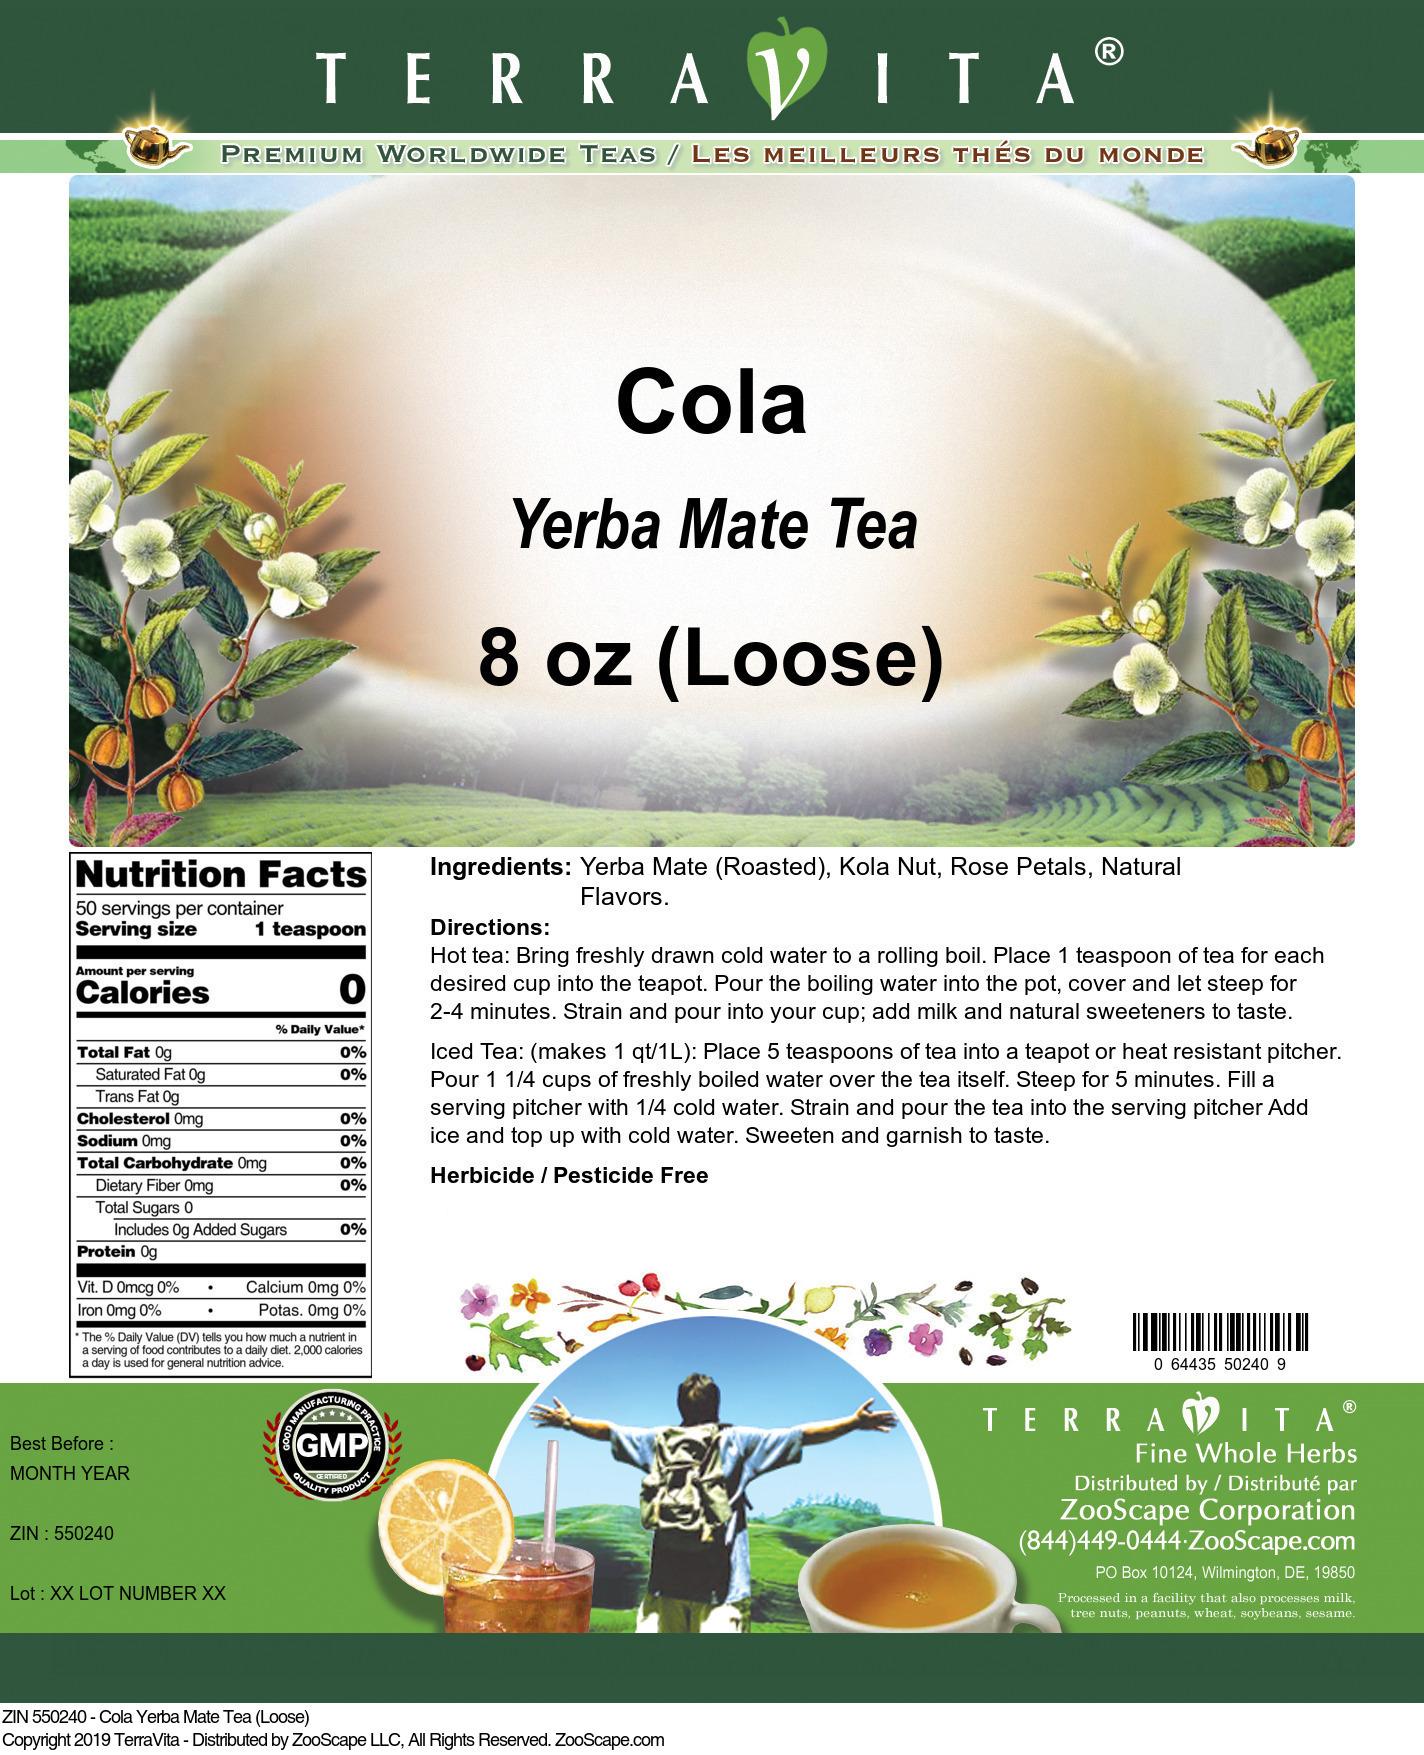 Cola Yerba Mate Tea (Loose)